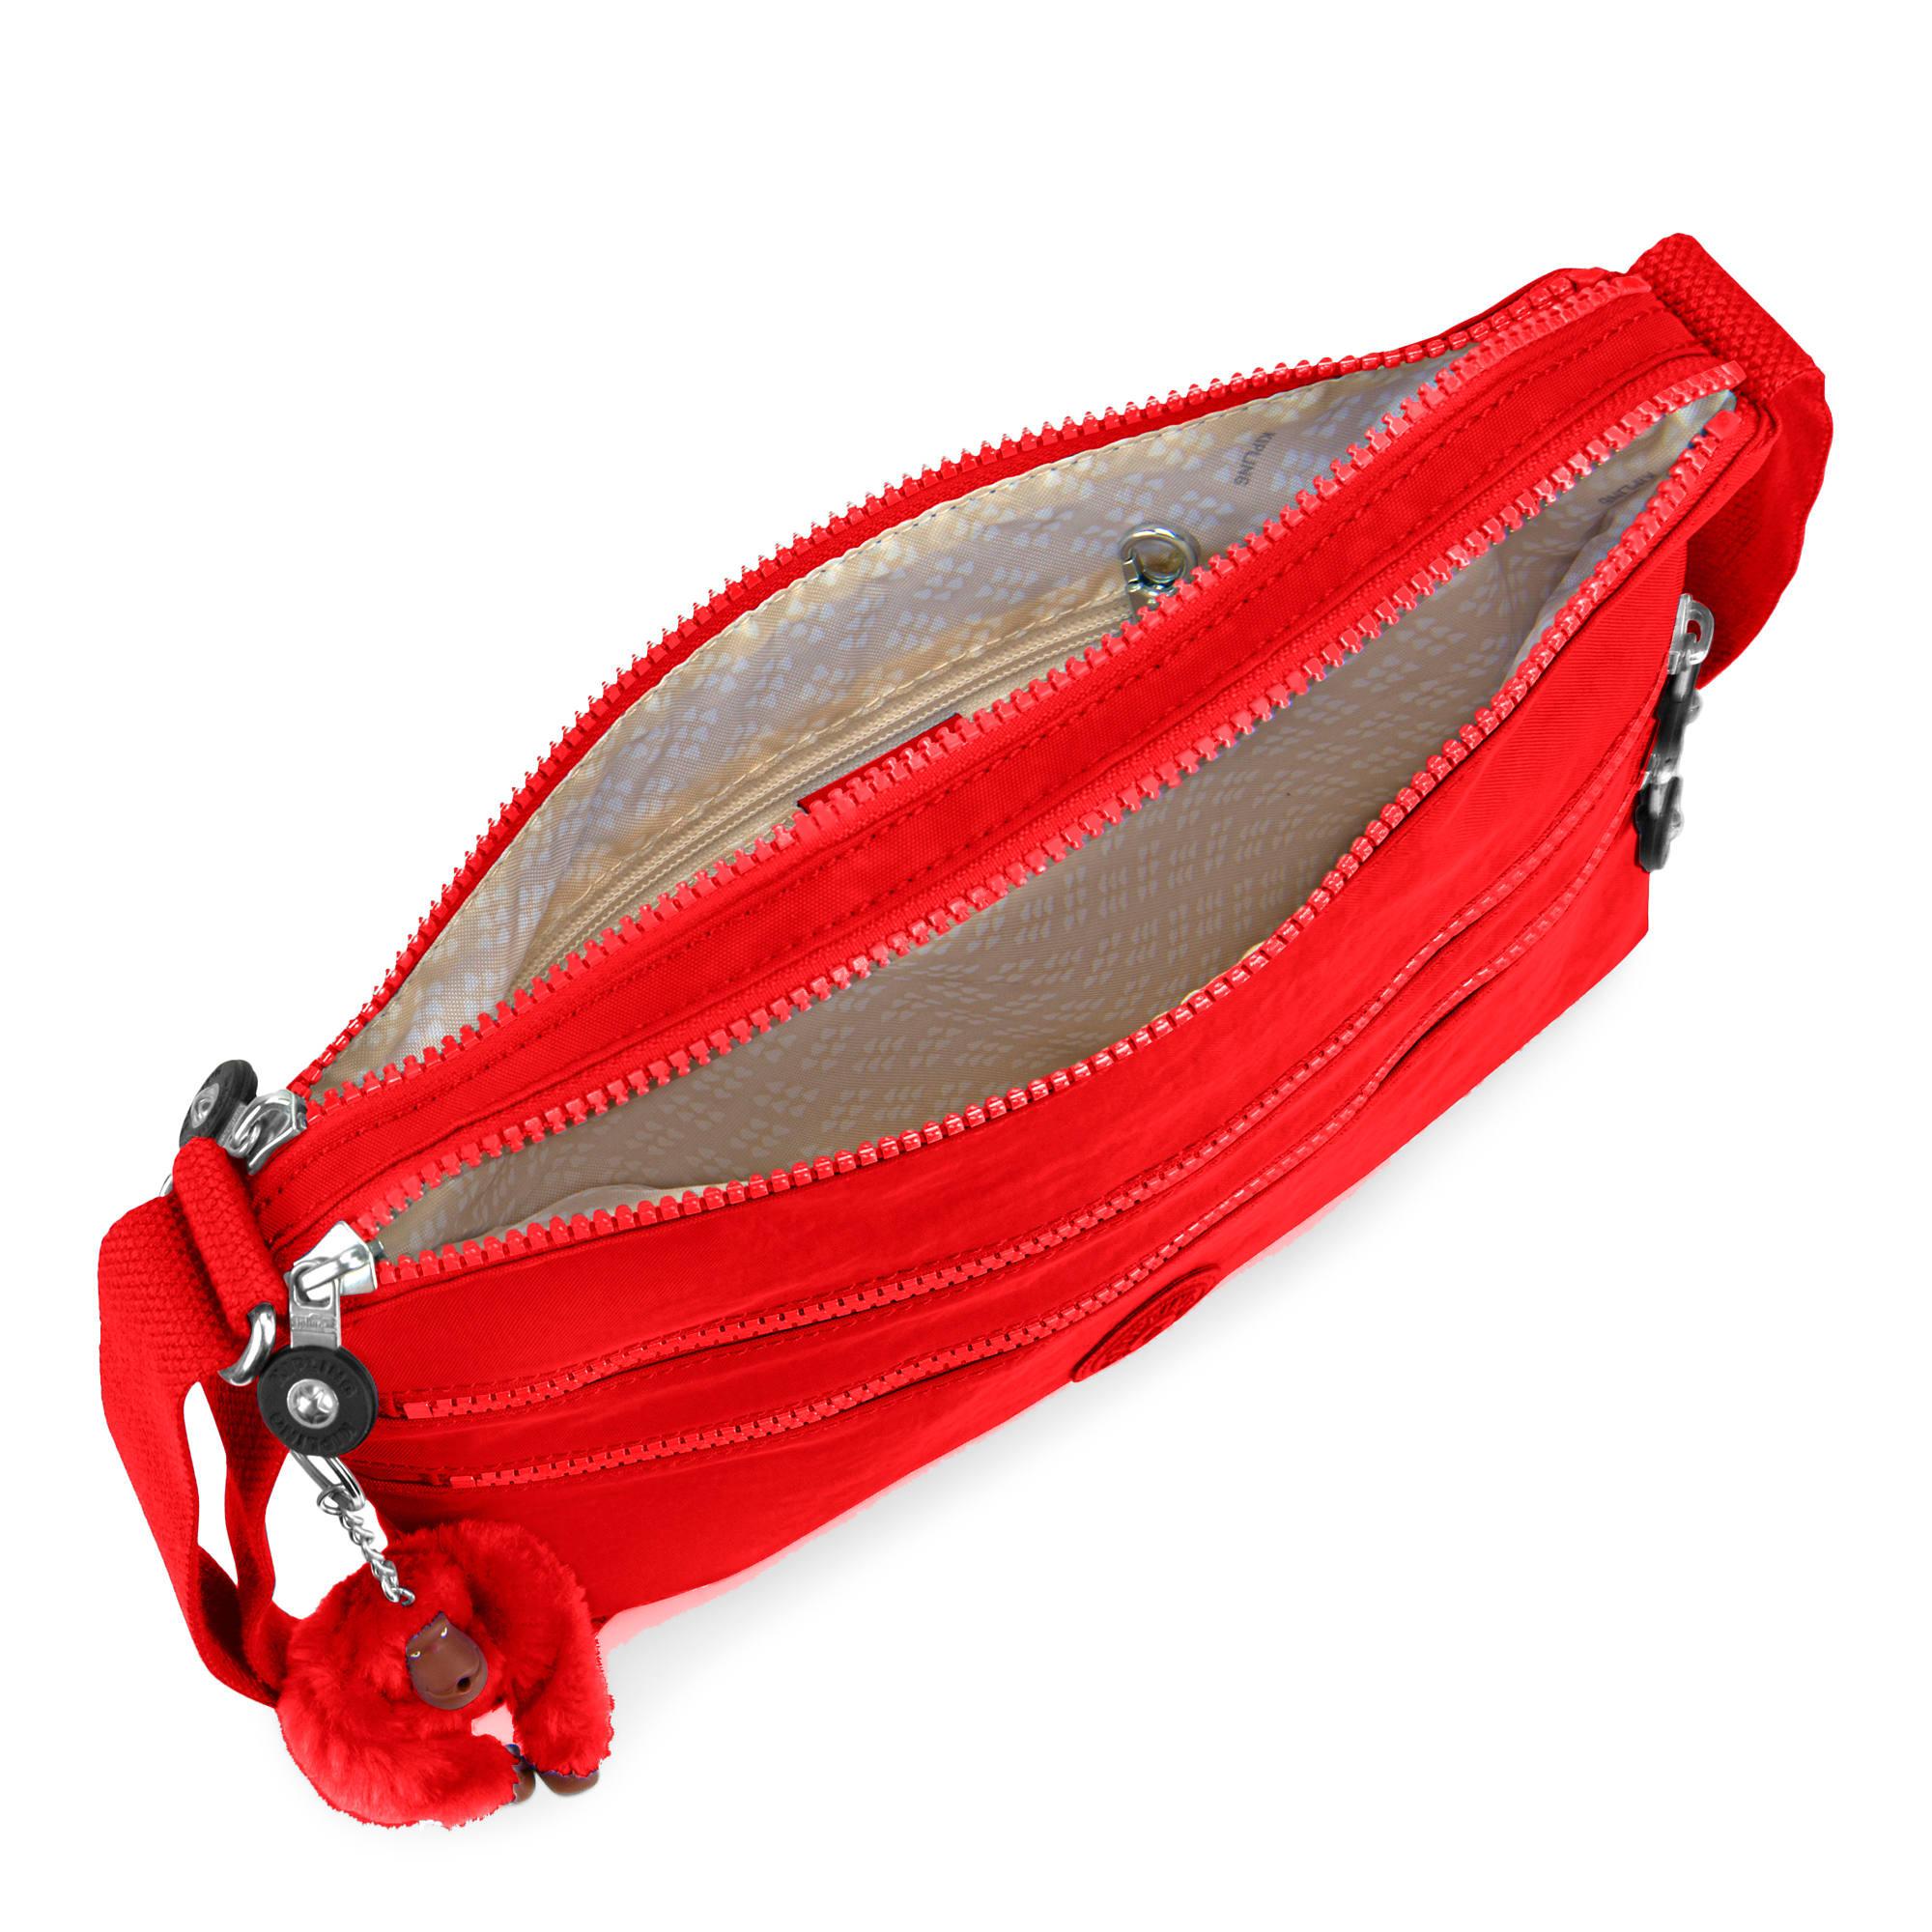 Kipling-Alvar-Metallic-Crossbody-Bag miniature 12